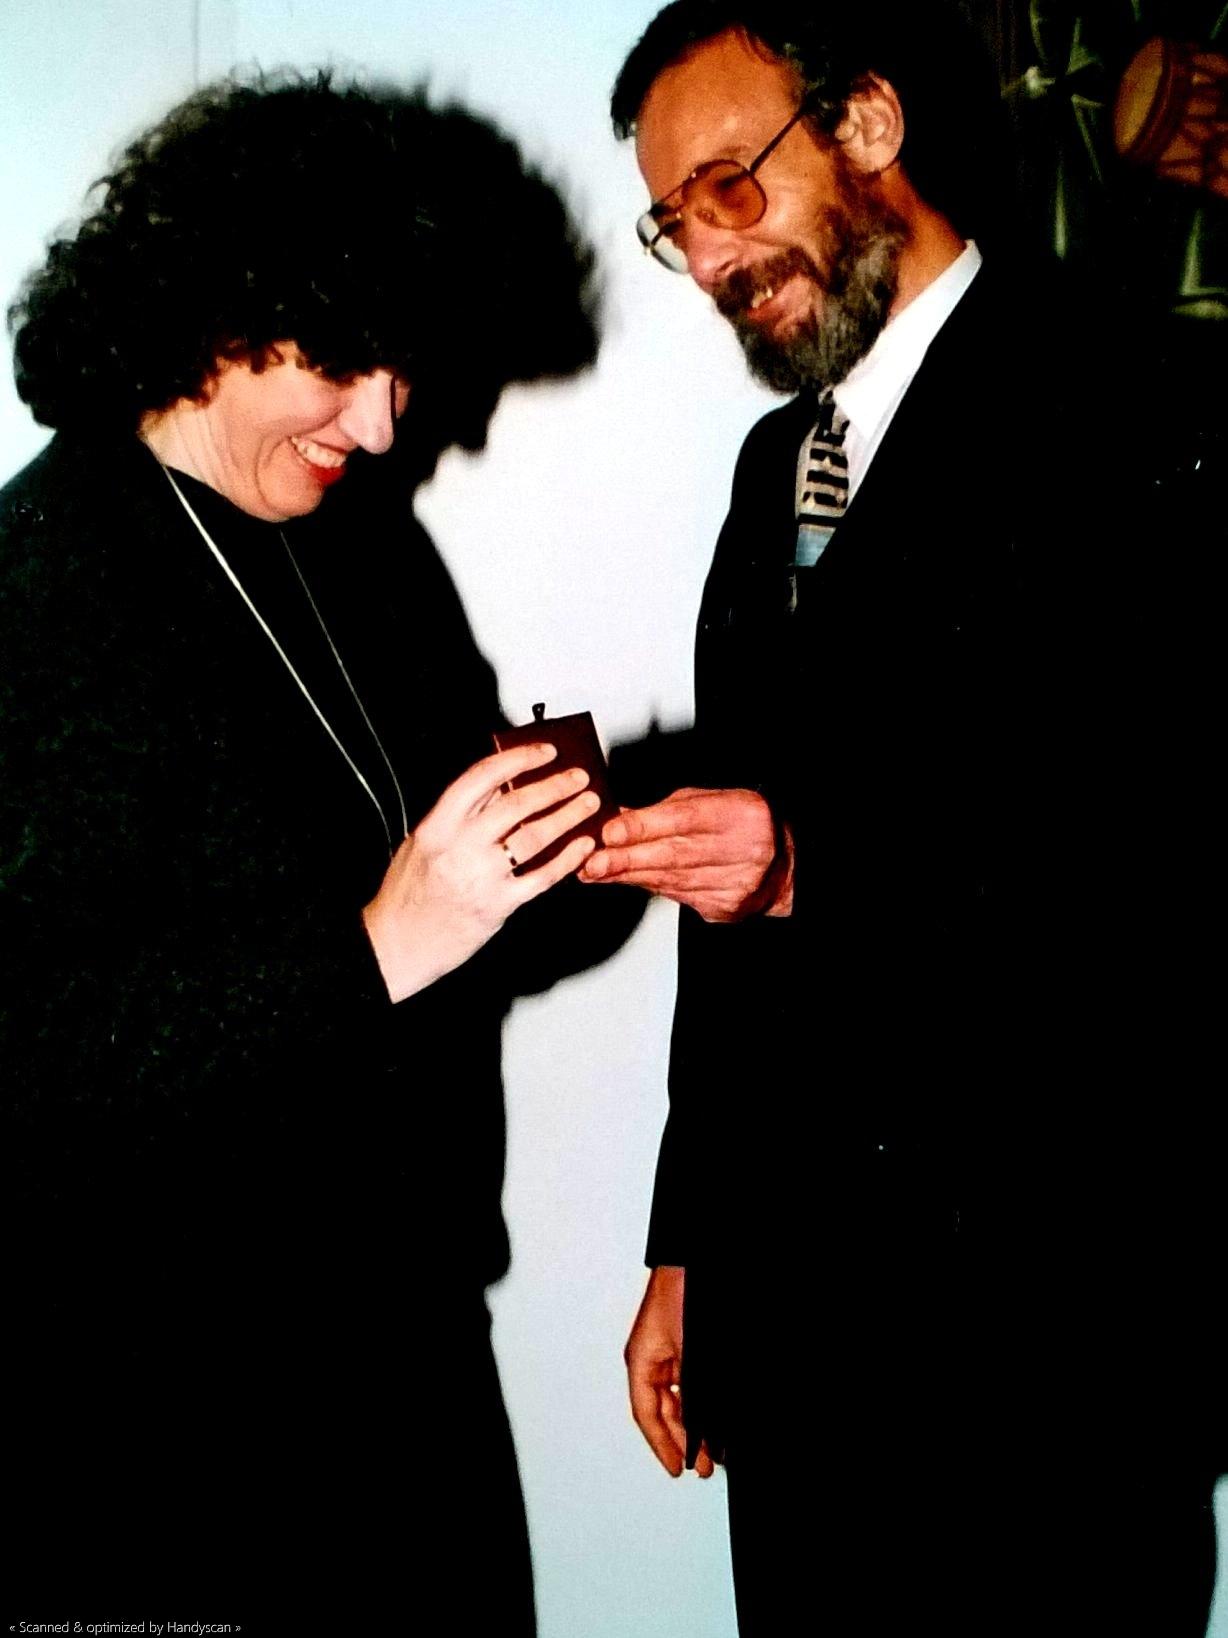 Srđan Hofman, end of 1980s